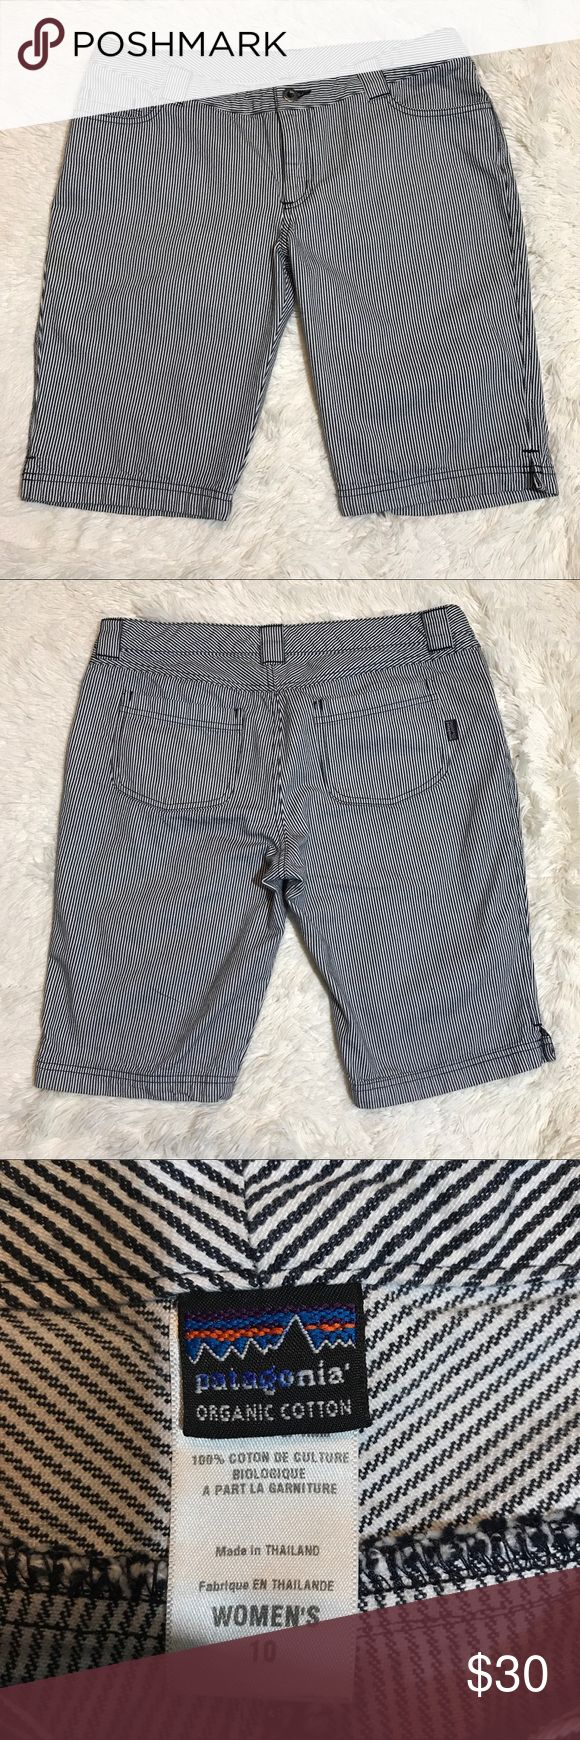 "Patagonia Nautical Shorts Patagonia women's navy blue and white stripped Bermuda shorts  Waist - 17""  Length - 21"" Patagonia Shorts Bermudas"